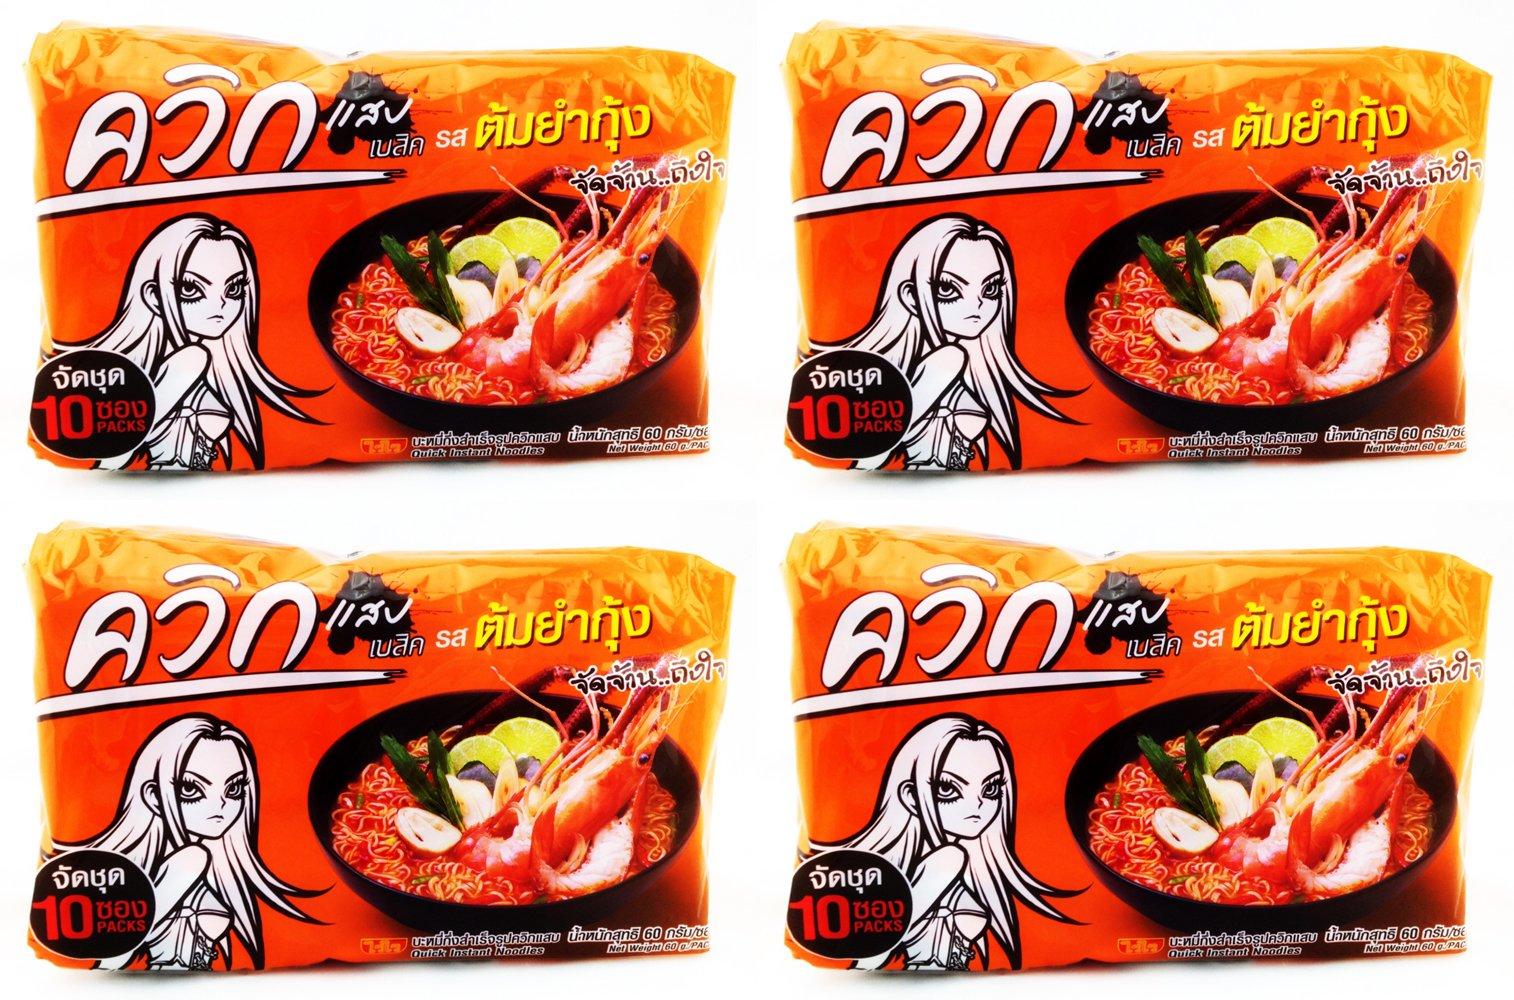 4 Packages TOM YUM Shrimp Flavour Instant Noodles, Net. Wt. 60 G X 10, Thai Best Seller [Favorite Thai Food], Product of Thailand